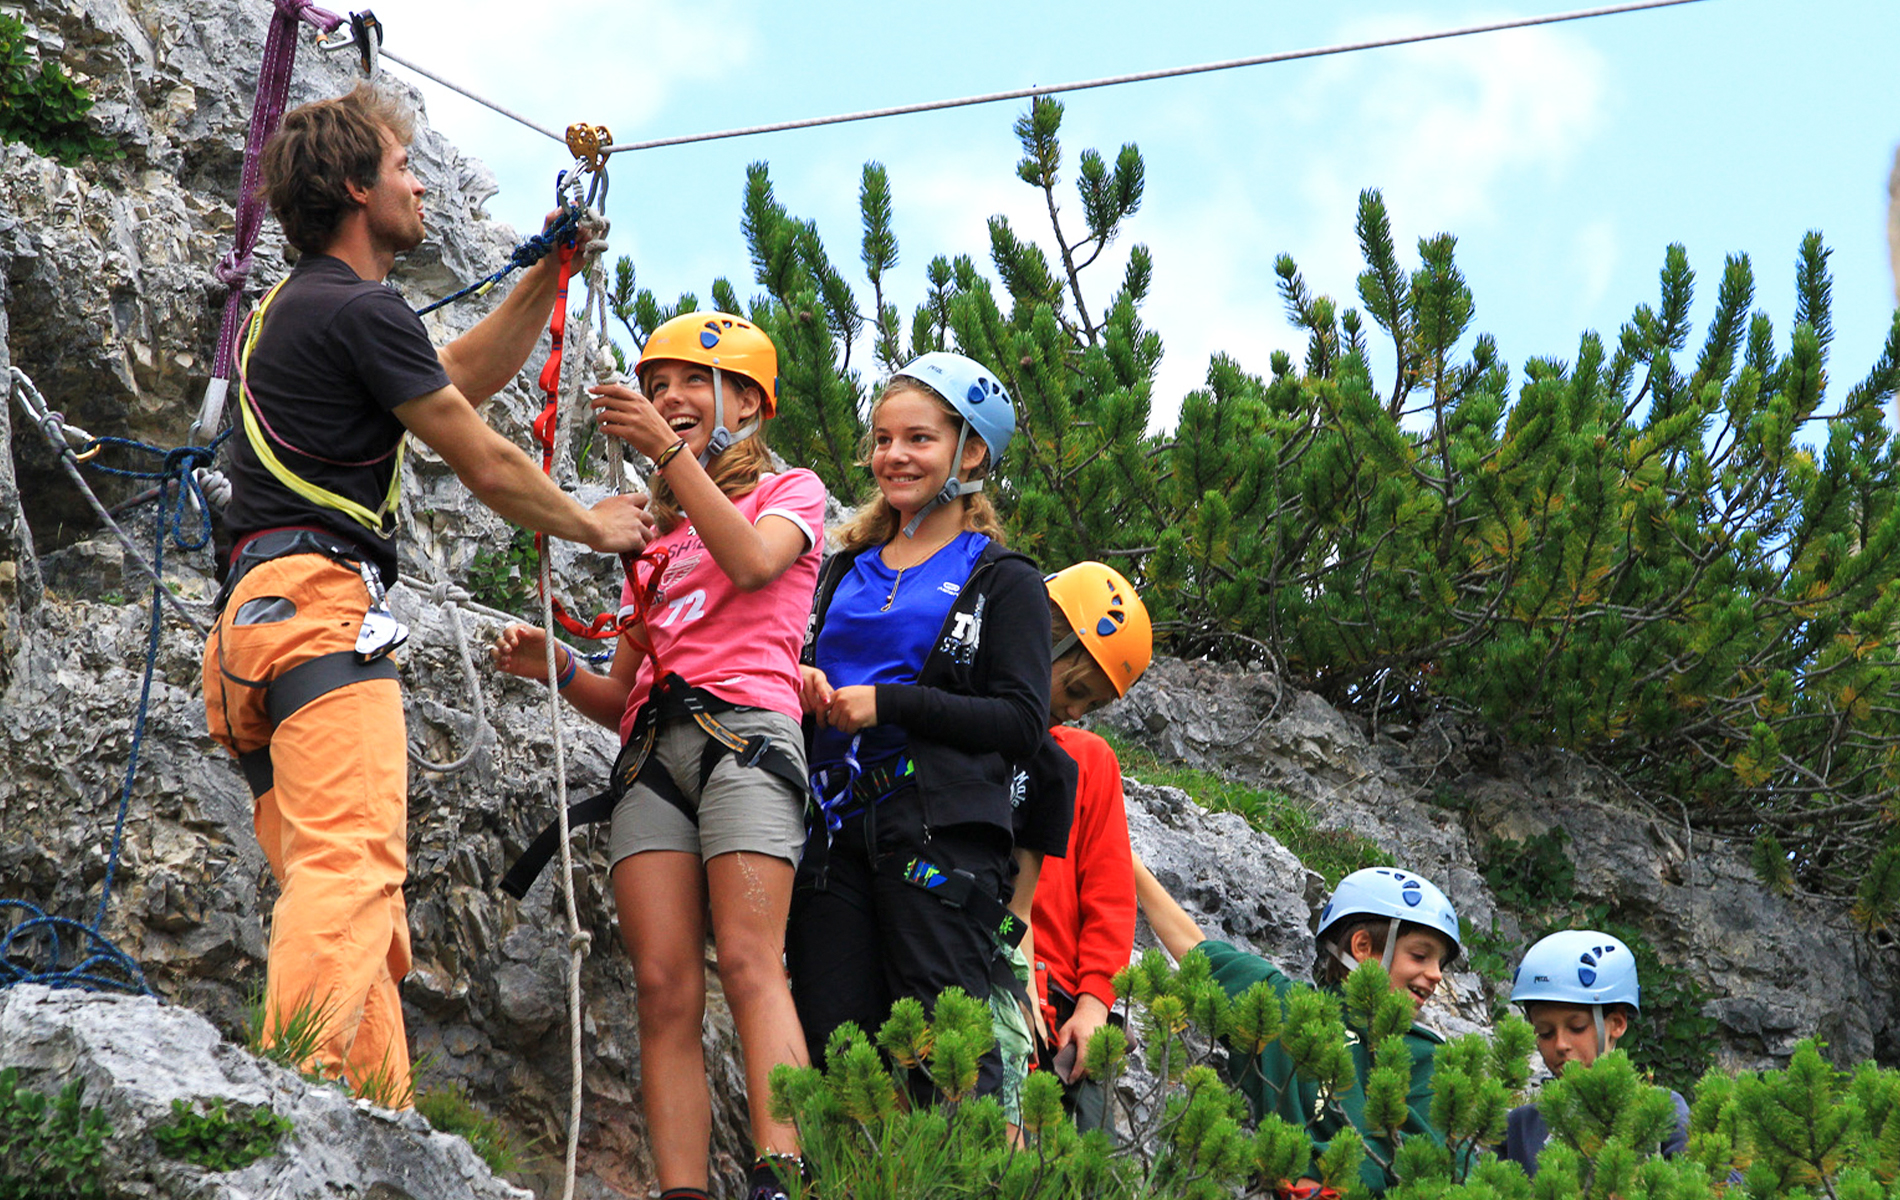 vacanze famiglia in val di fassa a moena hotel alle alpi